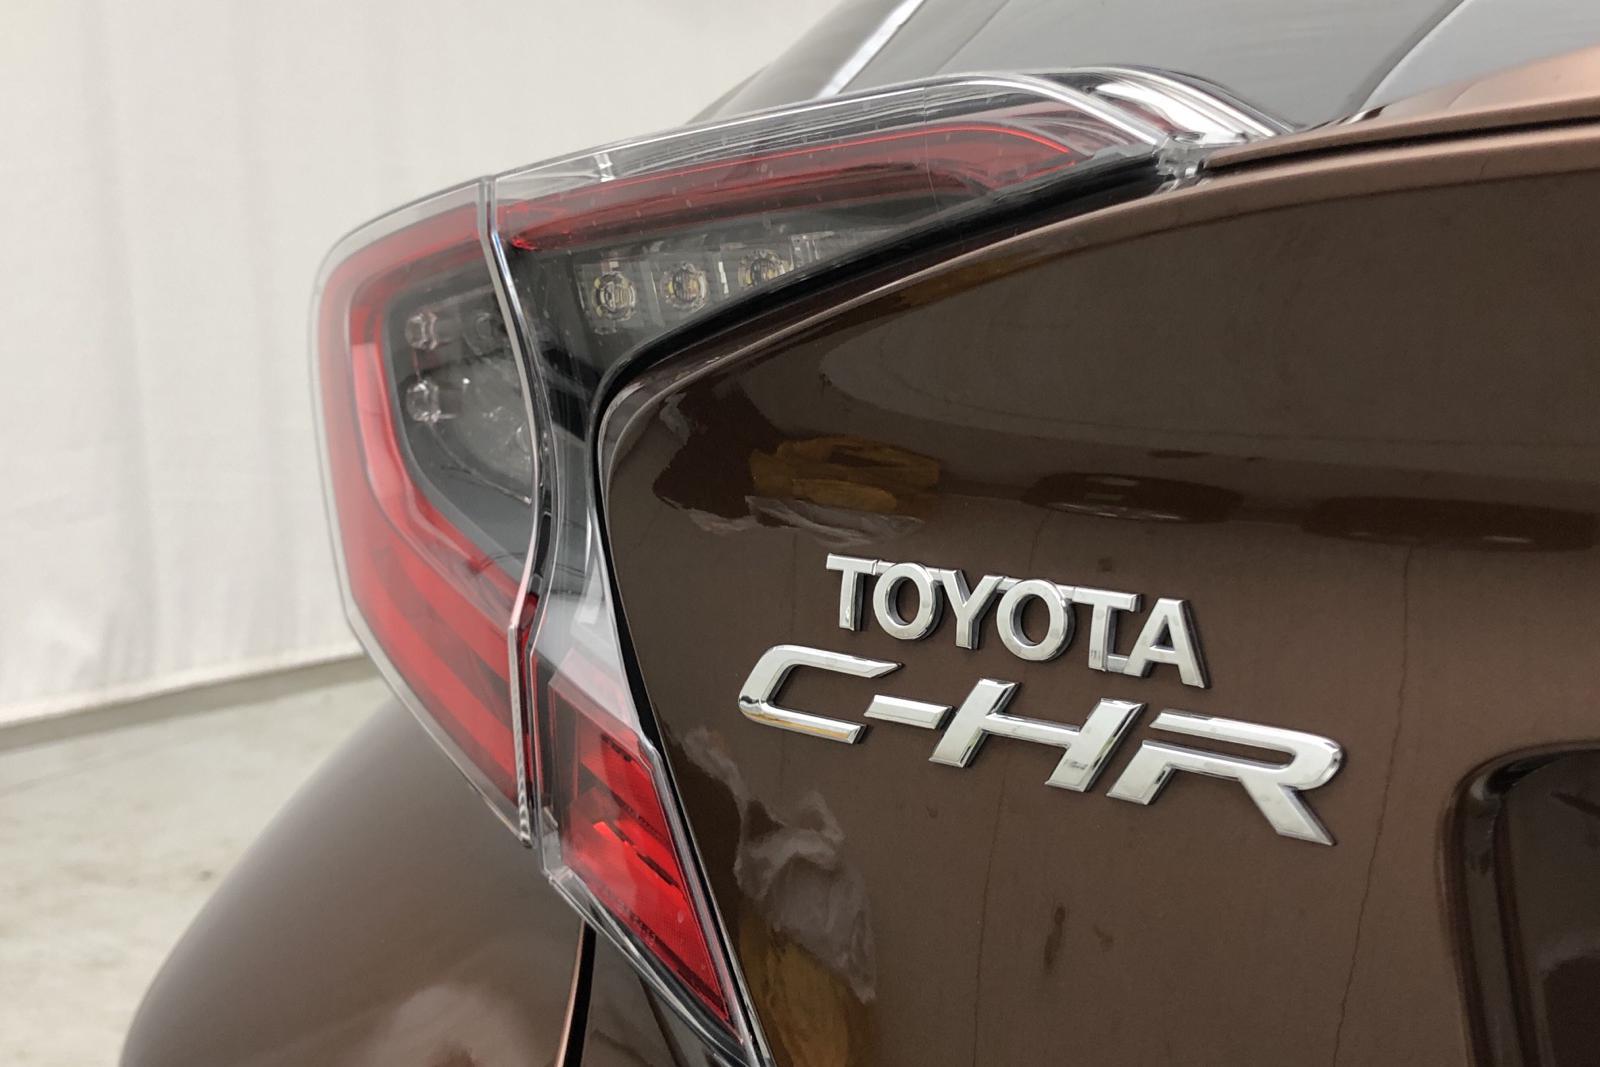 Toyota C-HR 1.8 HSD (122hk) - 0 mil - Automat - brun - 2017